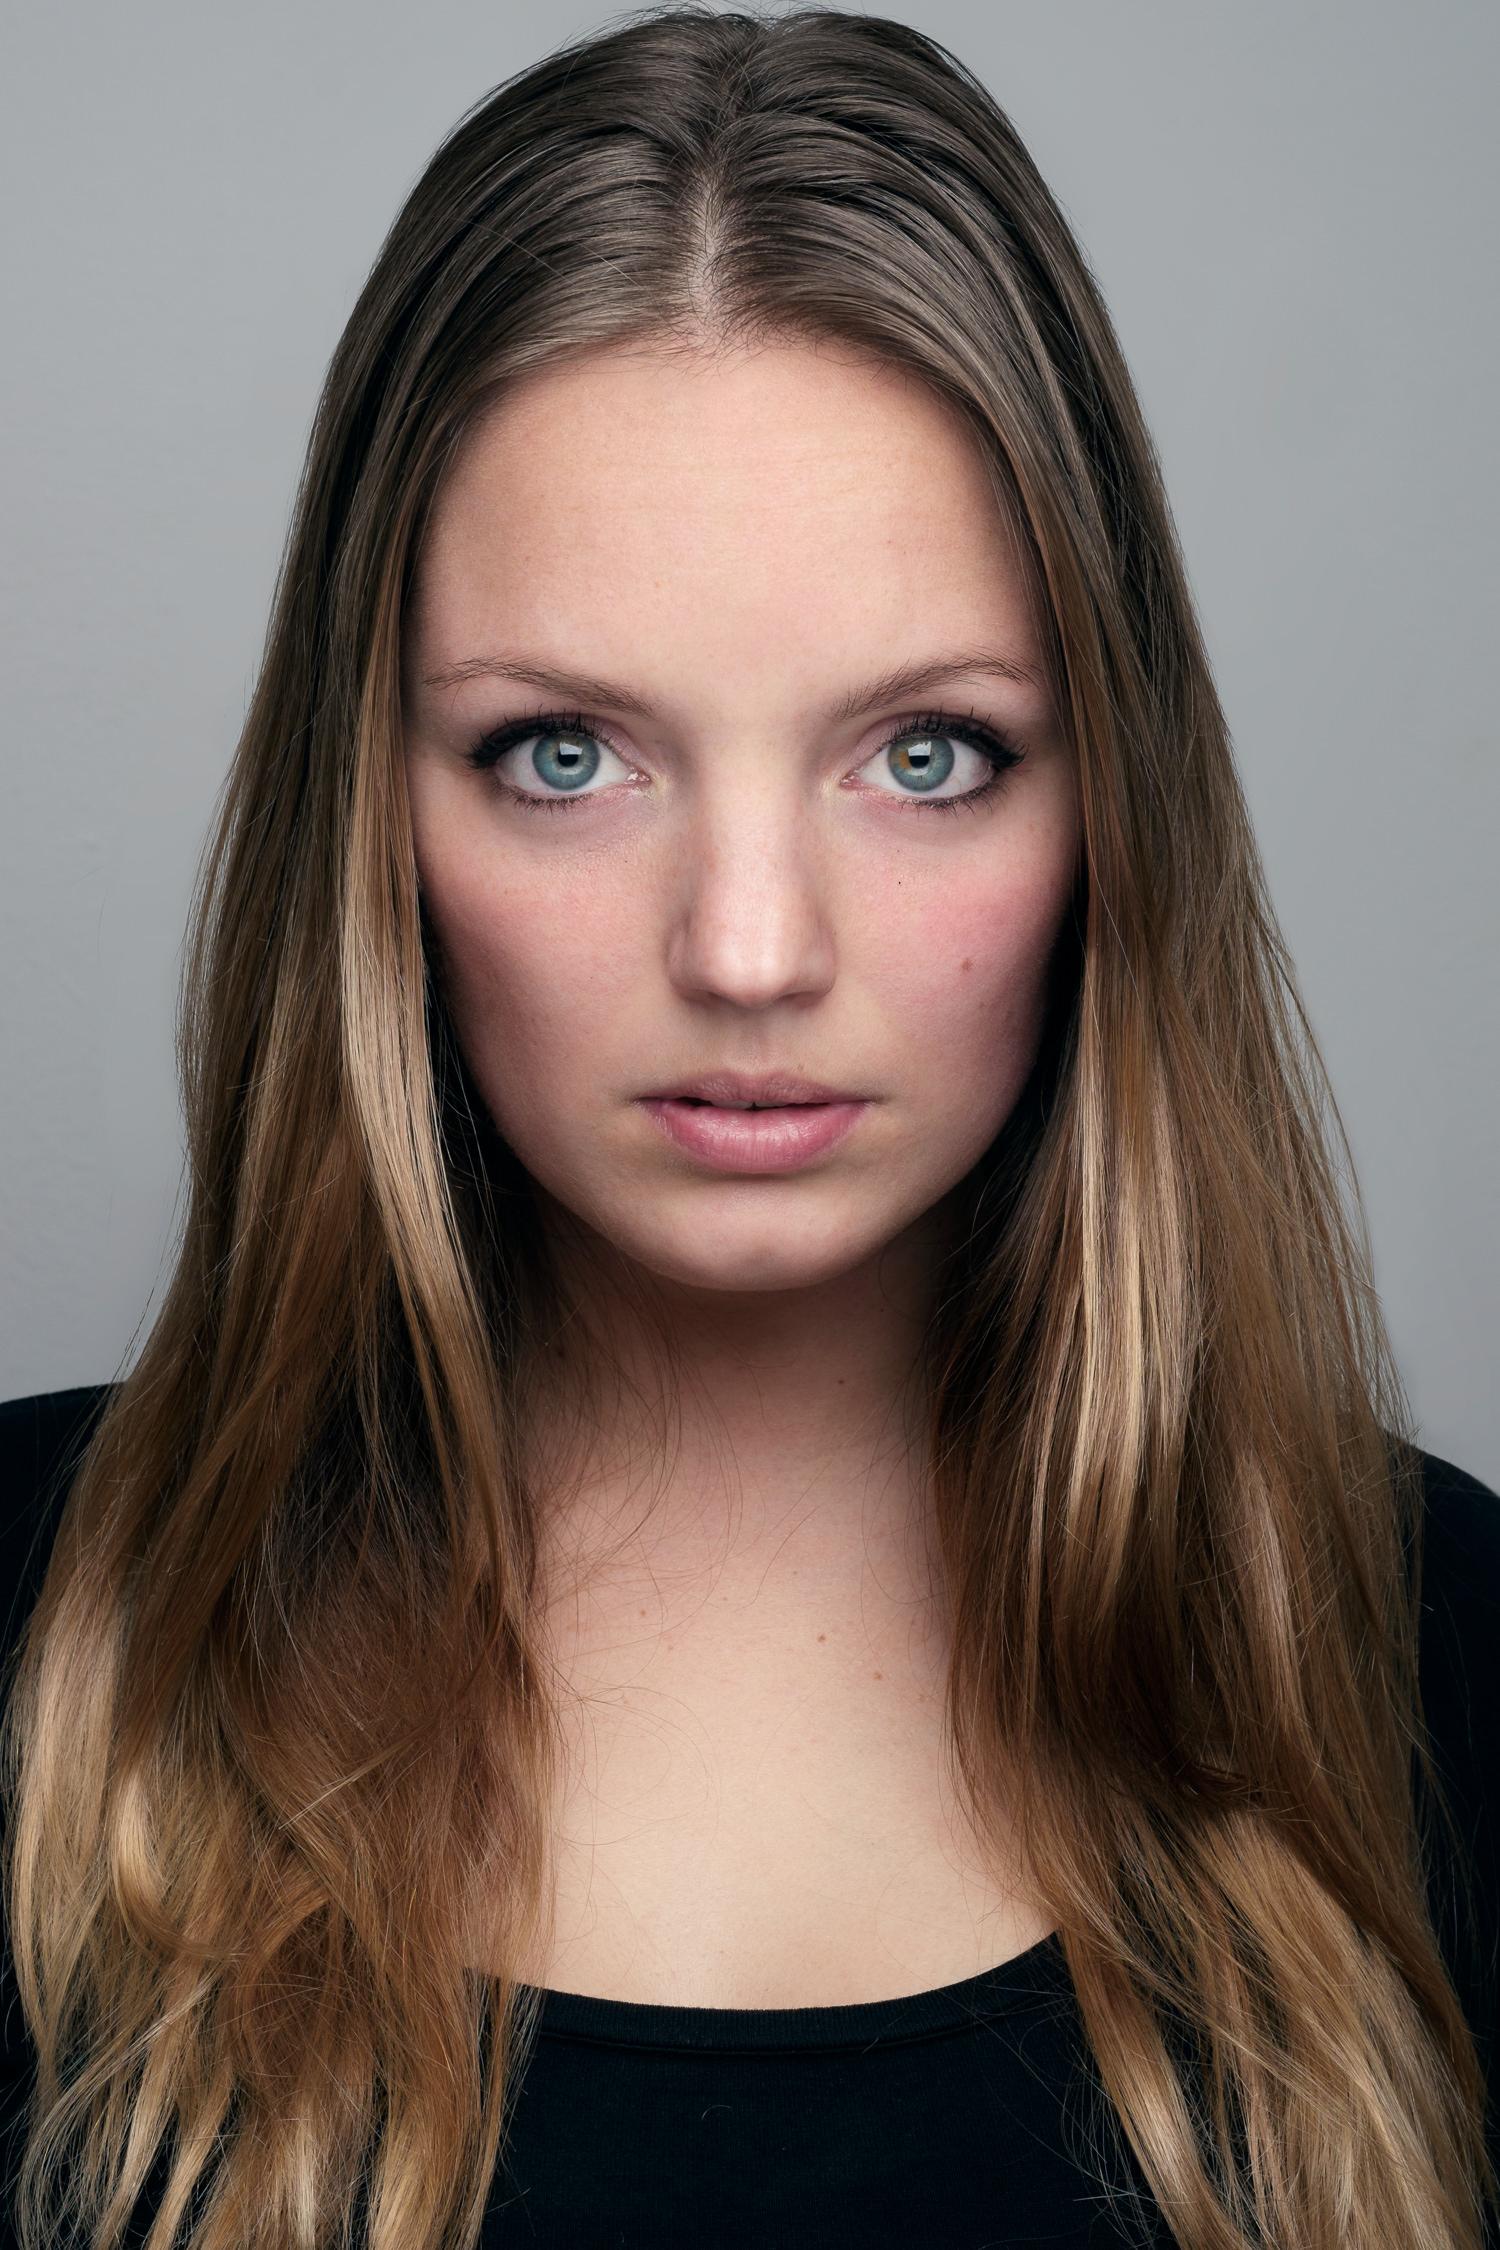 amsterdam-headshot-portrait-portret-bedrijf-zakelijk-mark-hadden-photographer-fotograaf-086.jpg